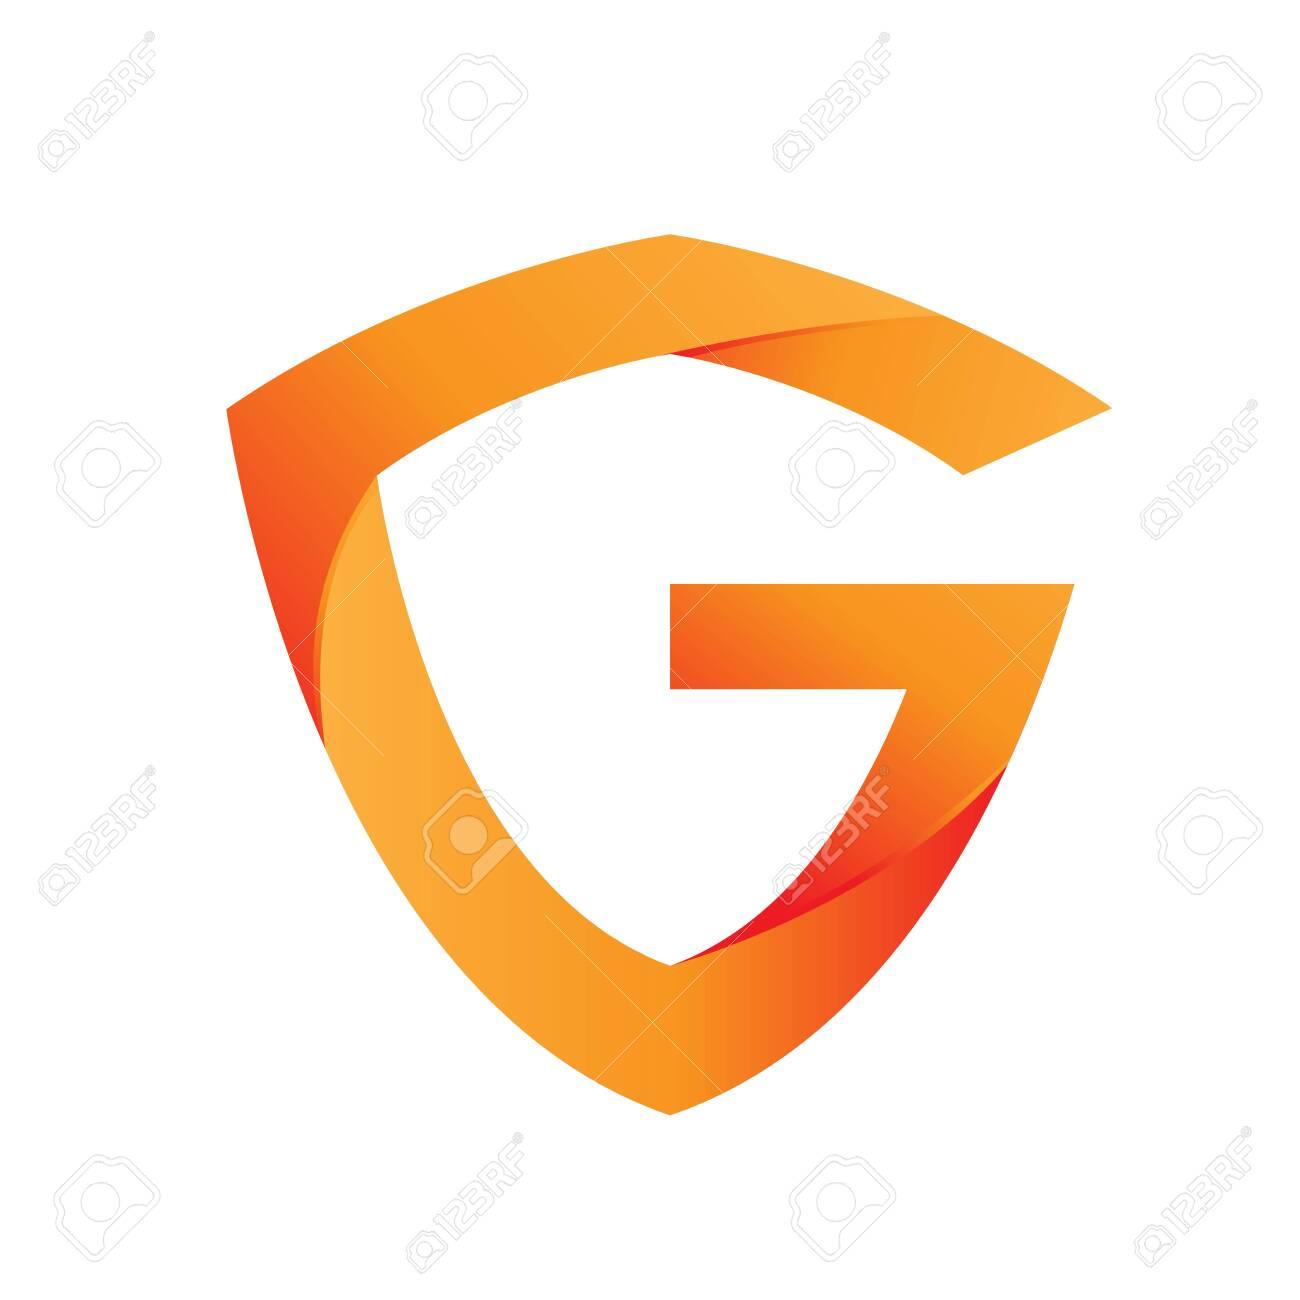 Shield G logo design template - 147411782